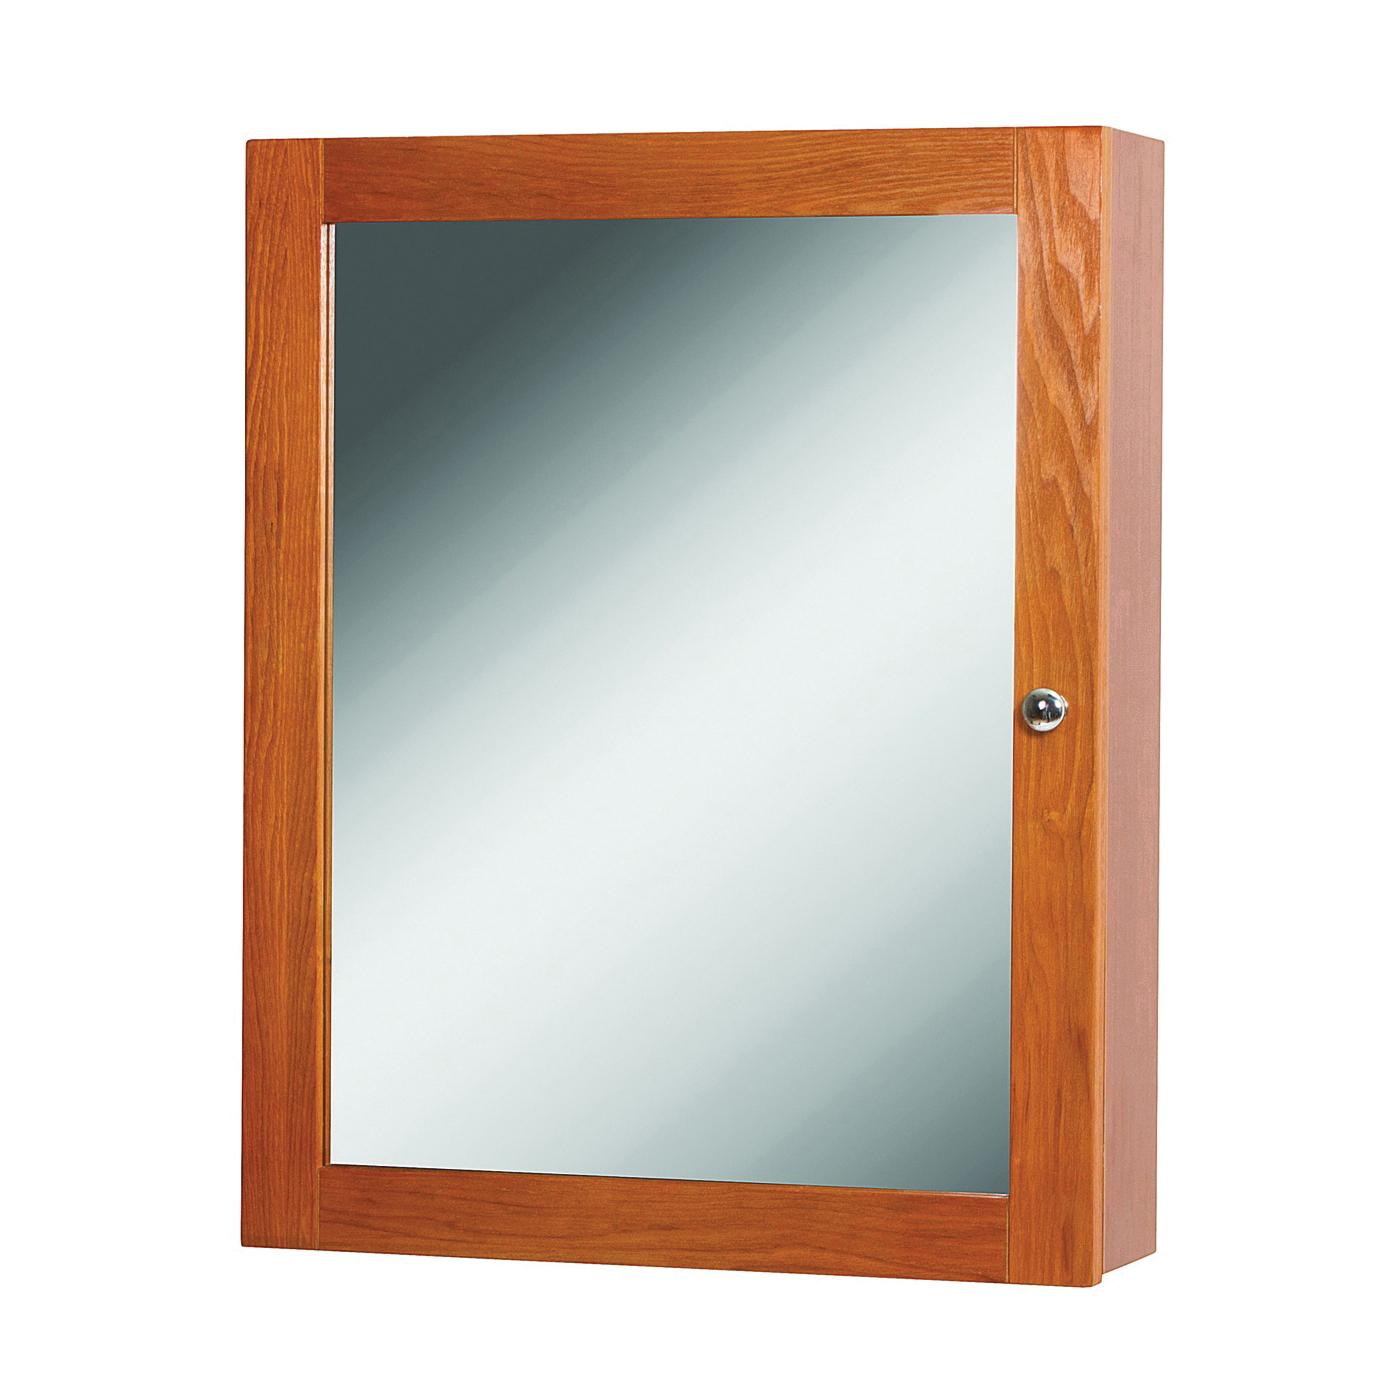 Picture of Foremost Worthington WROC1924 Medicine Cabinet, 19 in OAW, 4-7/8 in OAD, 23-7/8 in OAH, Oak, Chrome, 2-Shelf